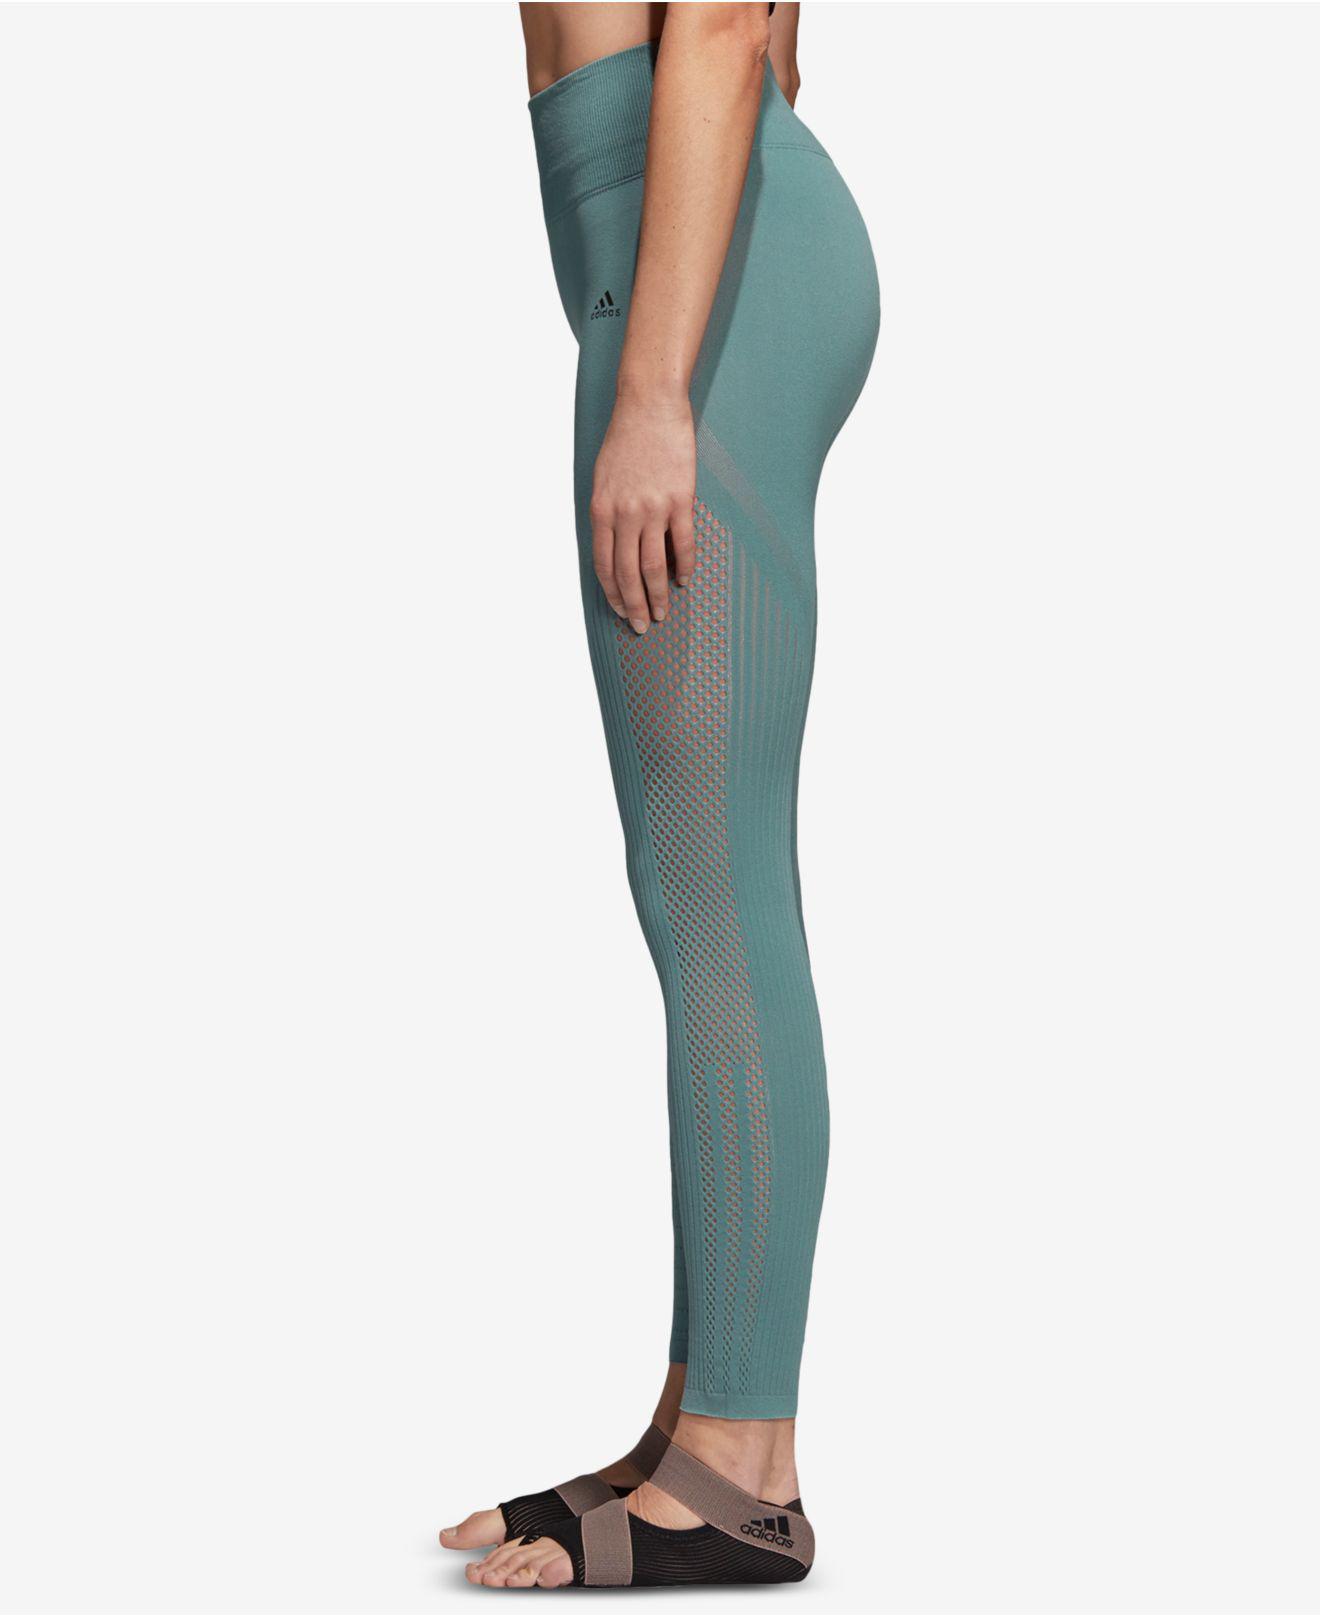 c14fde88adcc6 Adidas - Green Warp-knit High-rise Ankle Leggings - Lyst. View fullscreen